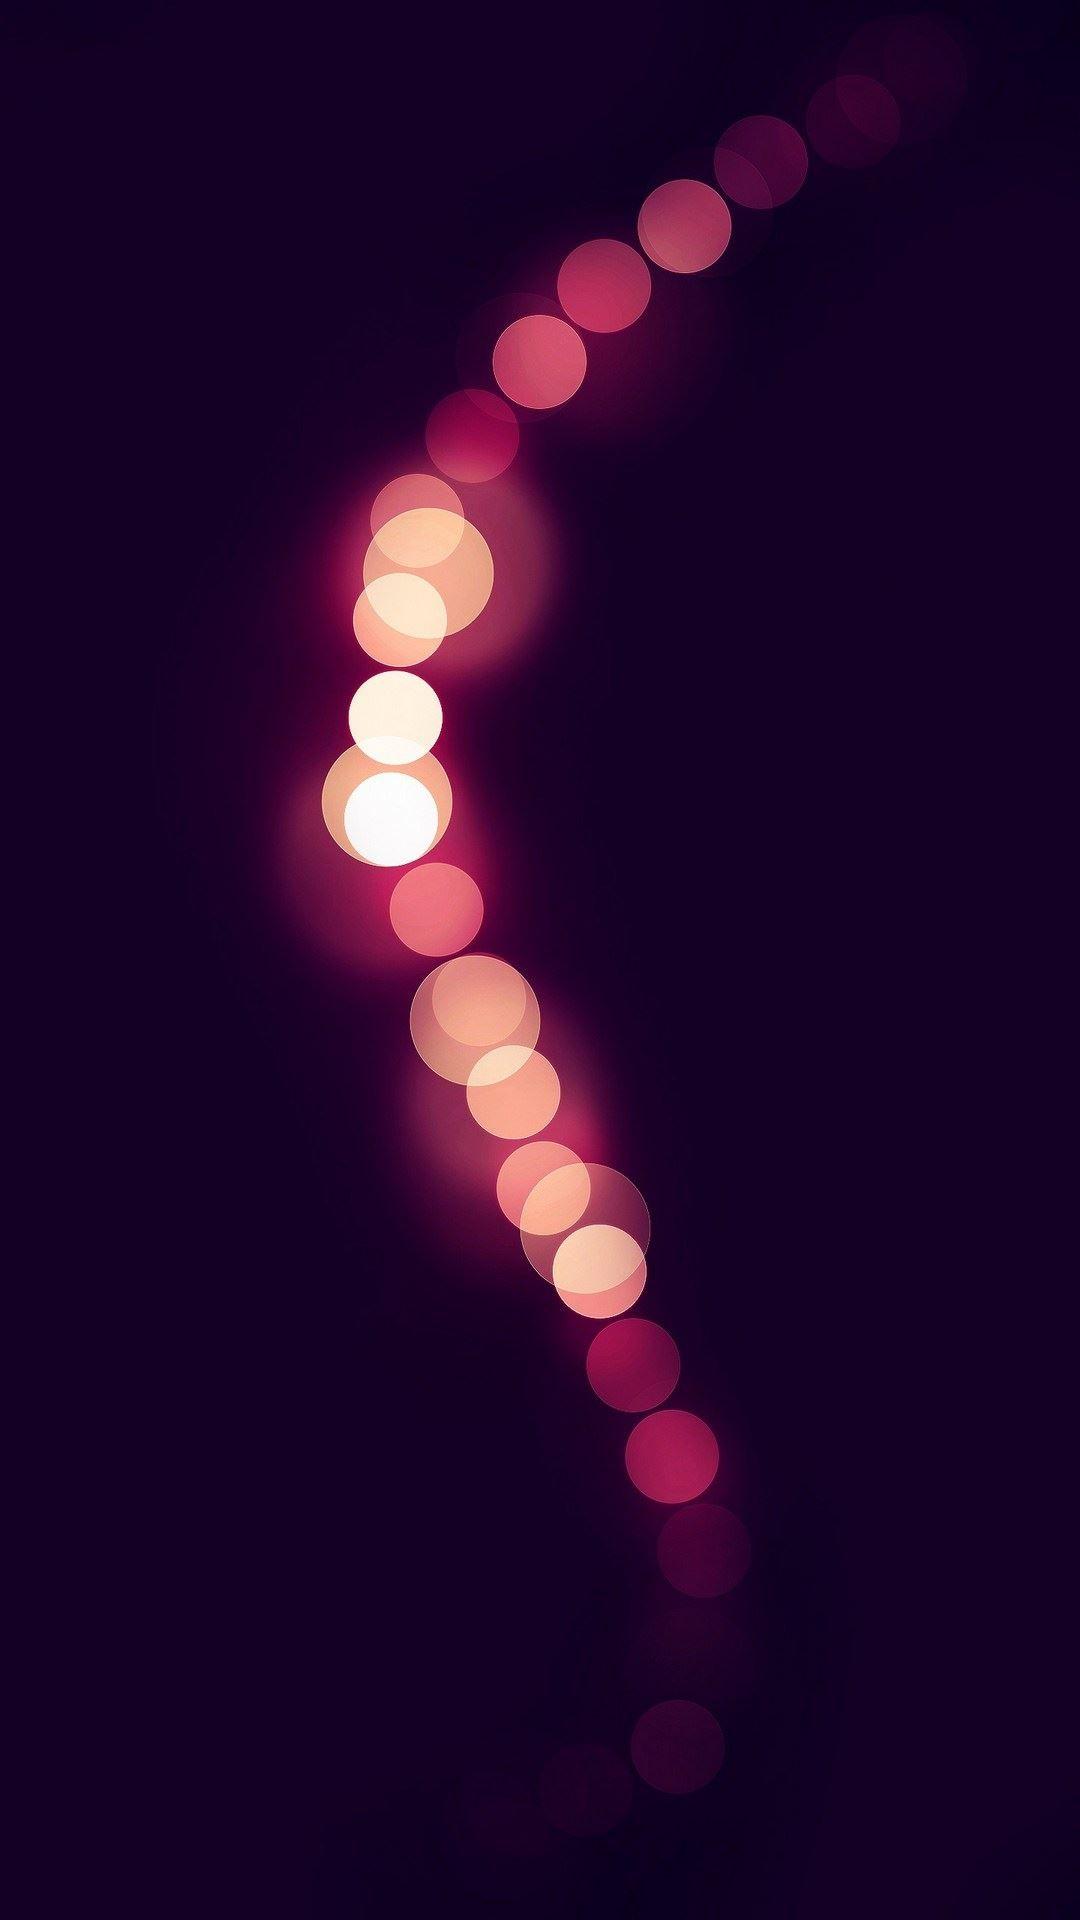 Pink Light Circles Bokeh iPhone 6 Plus HD Wallpaper.jpg 1